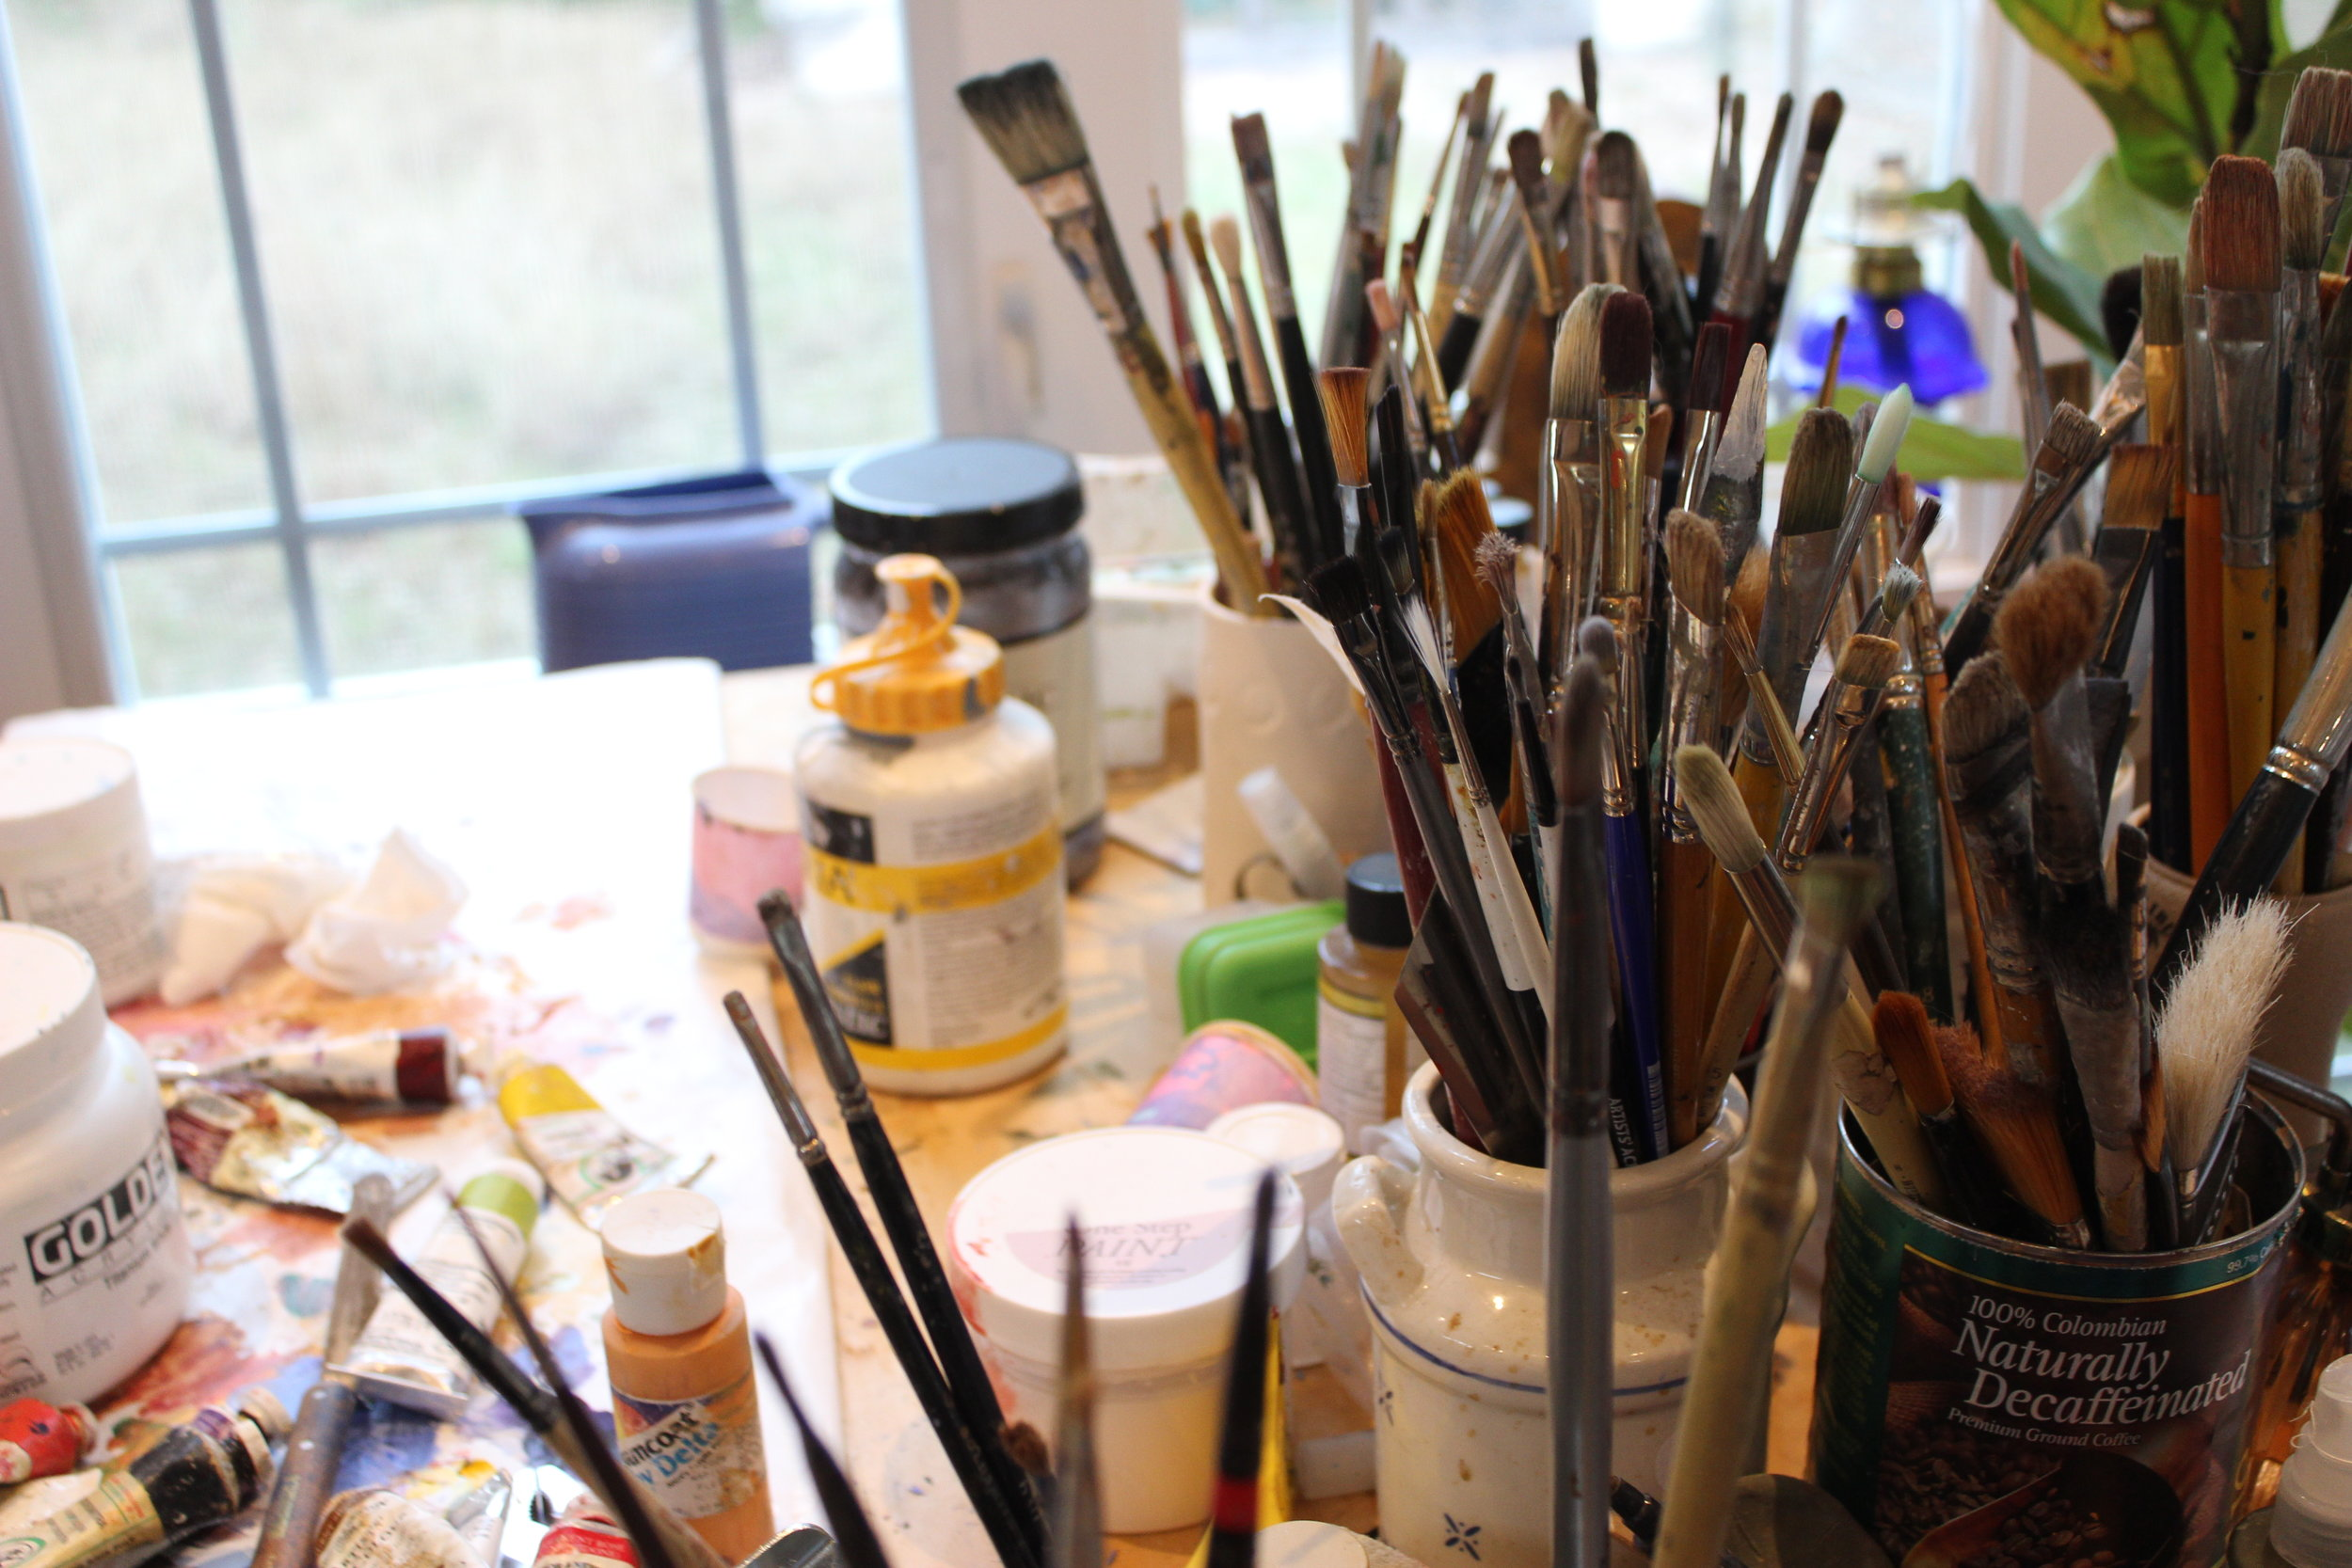 Cleve's in-home studio